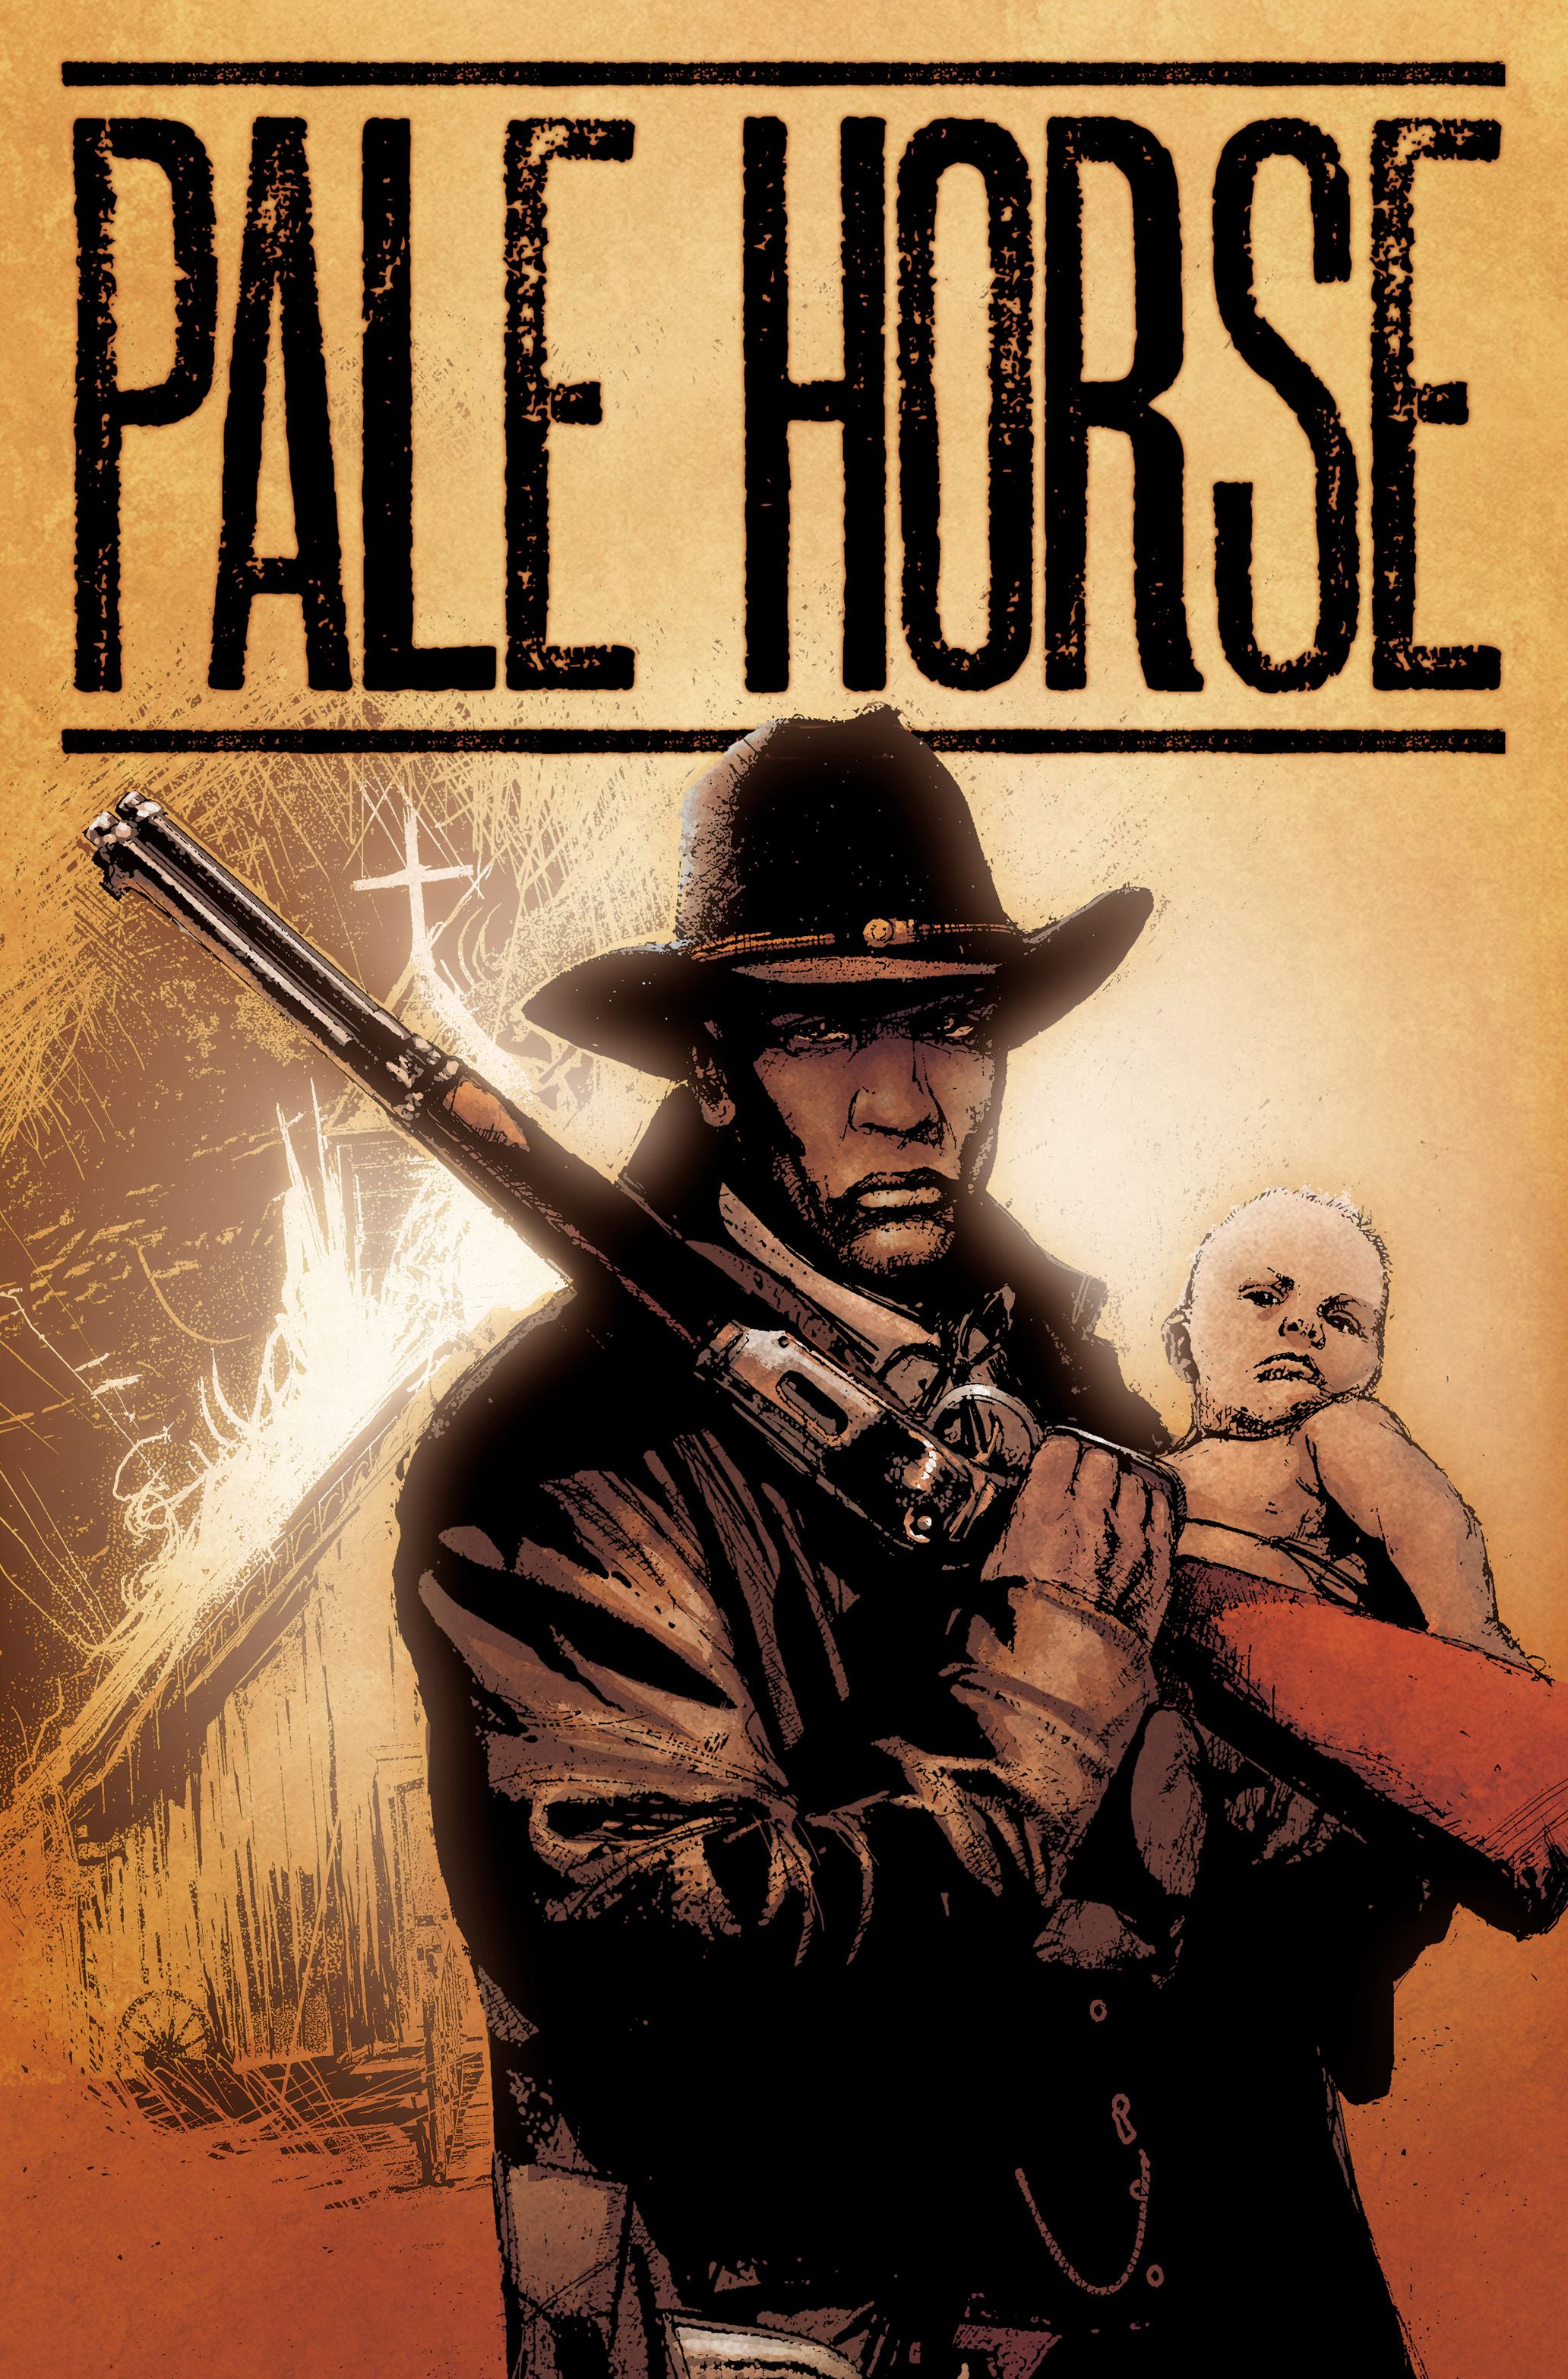 Pale horse 9781608860371 hr